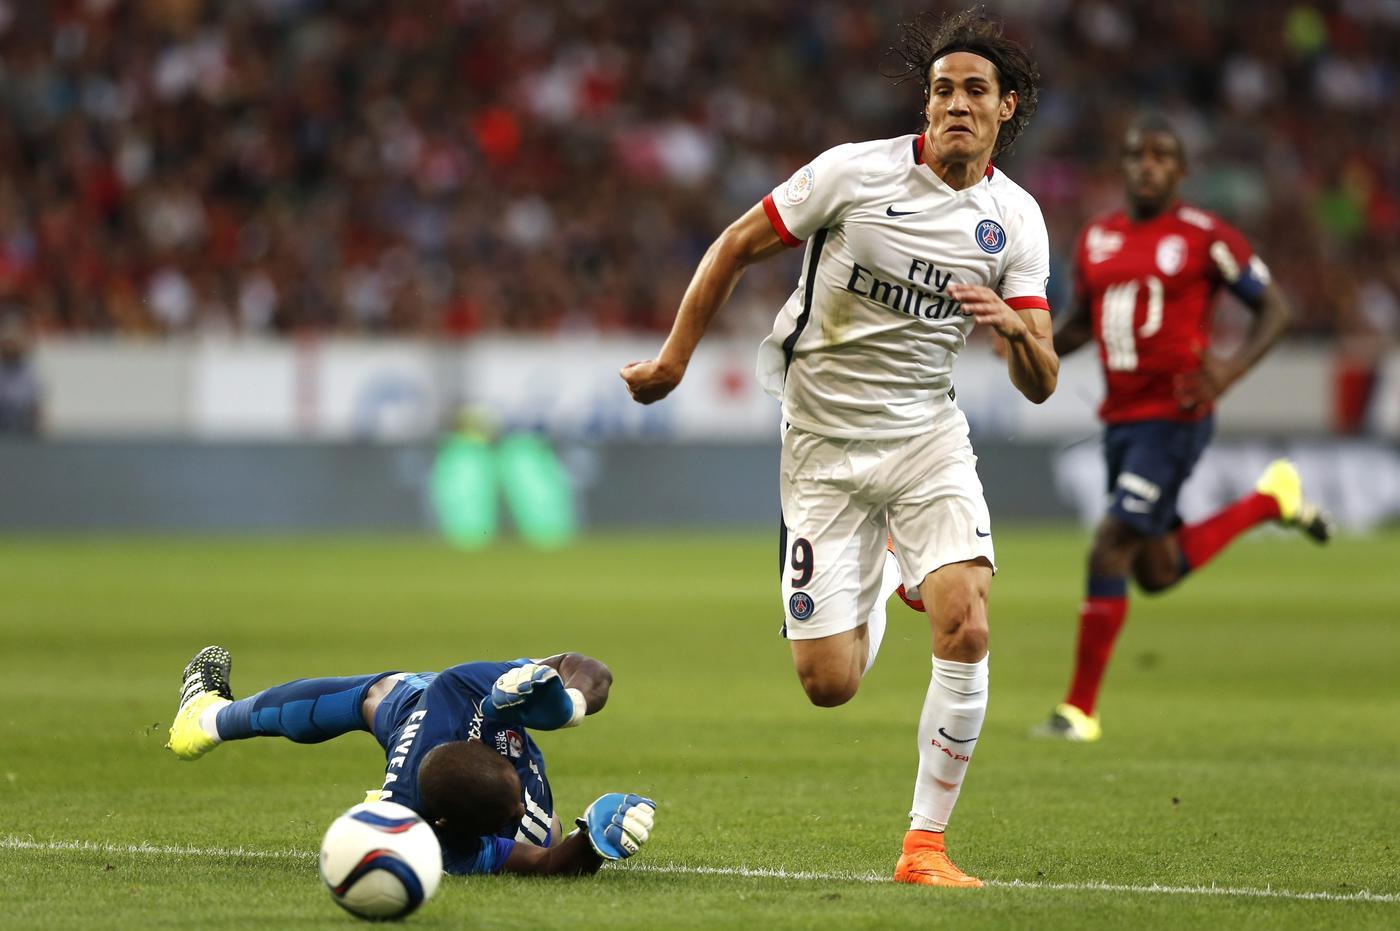 Arsenal target Edinson Cavani confident of transfer away from PSG, say reports